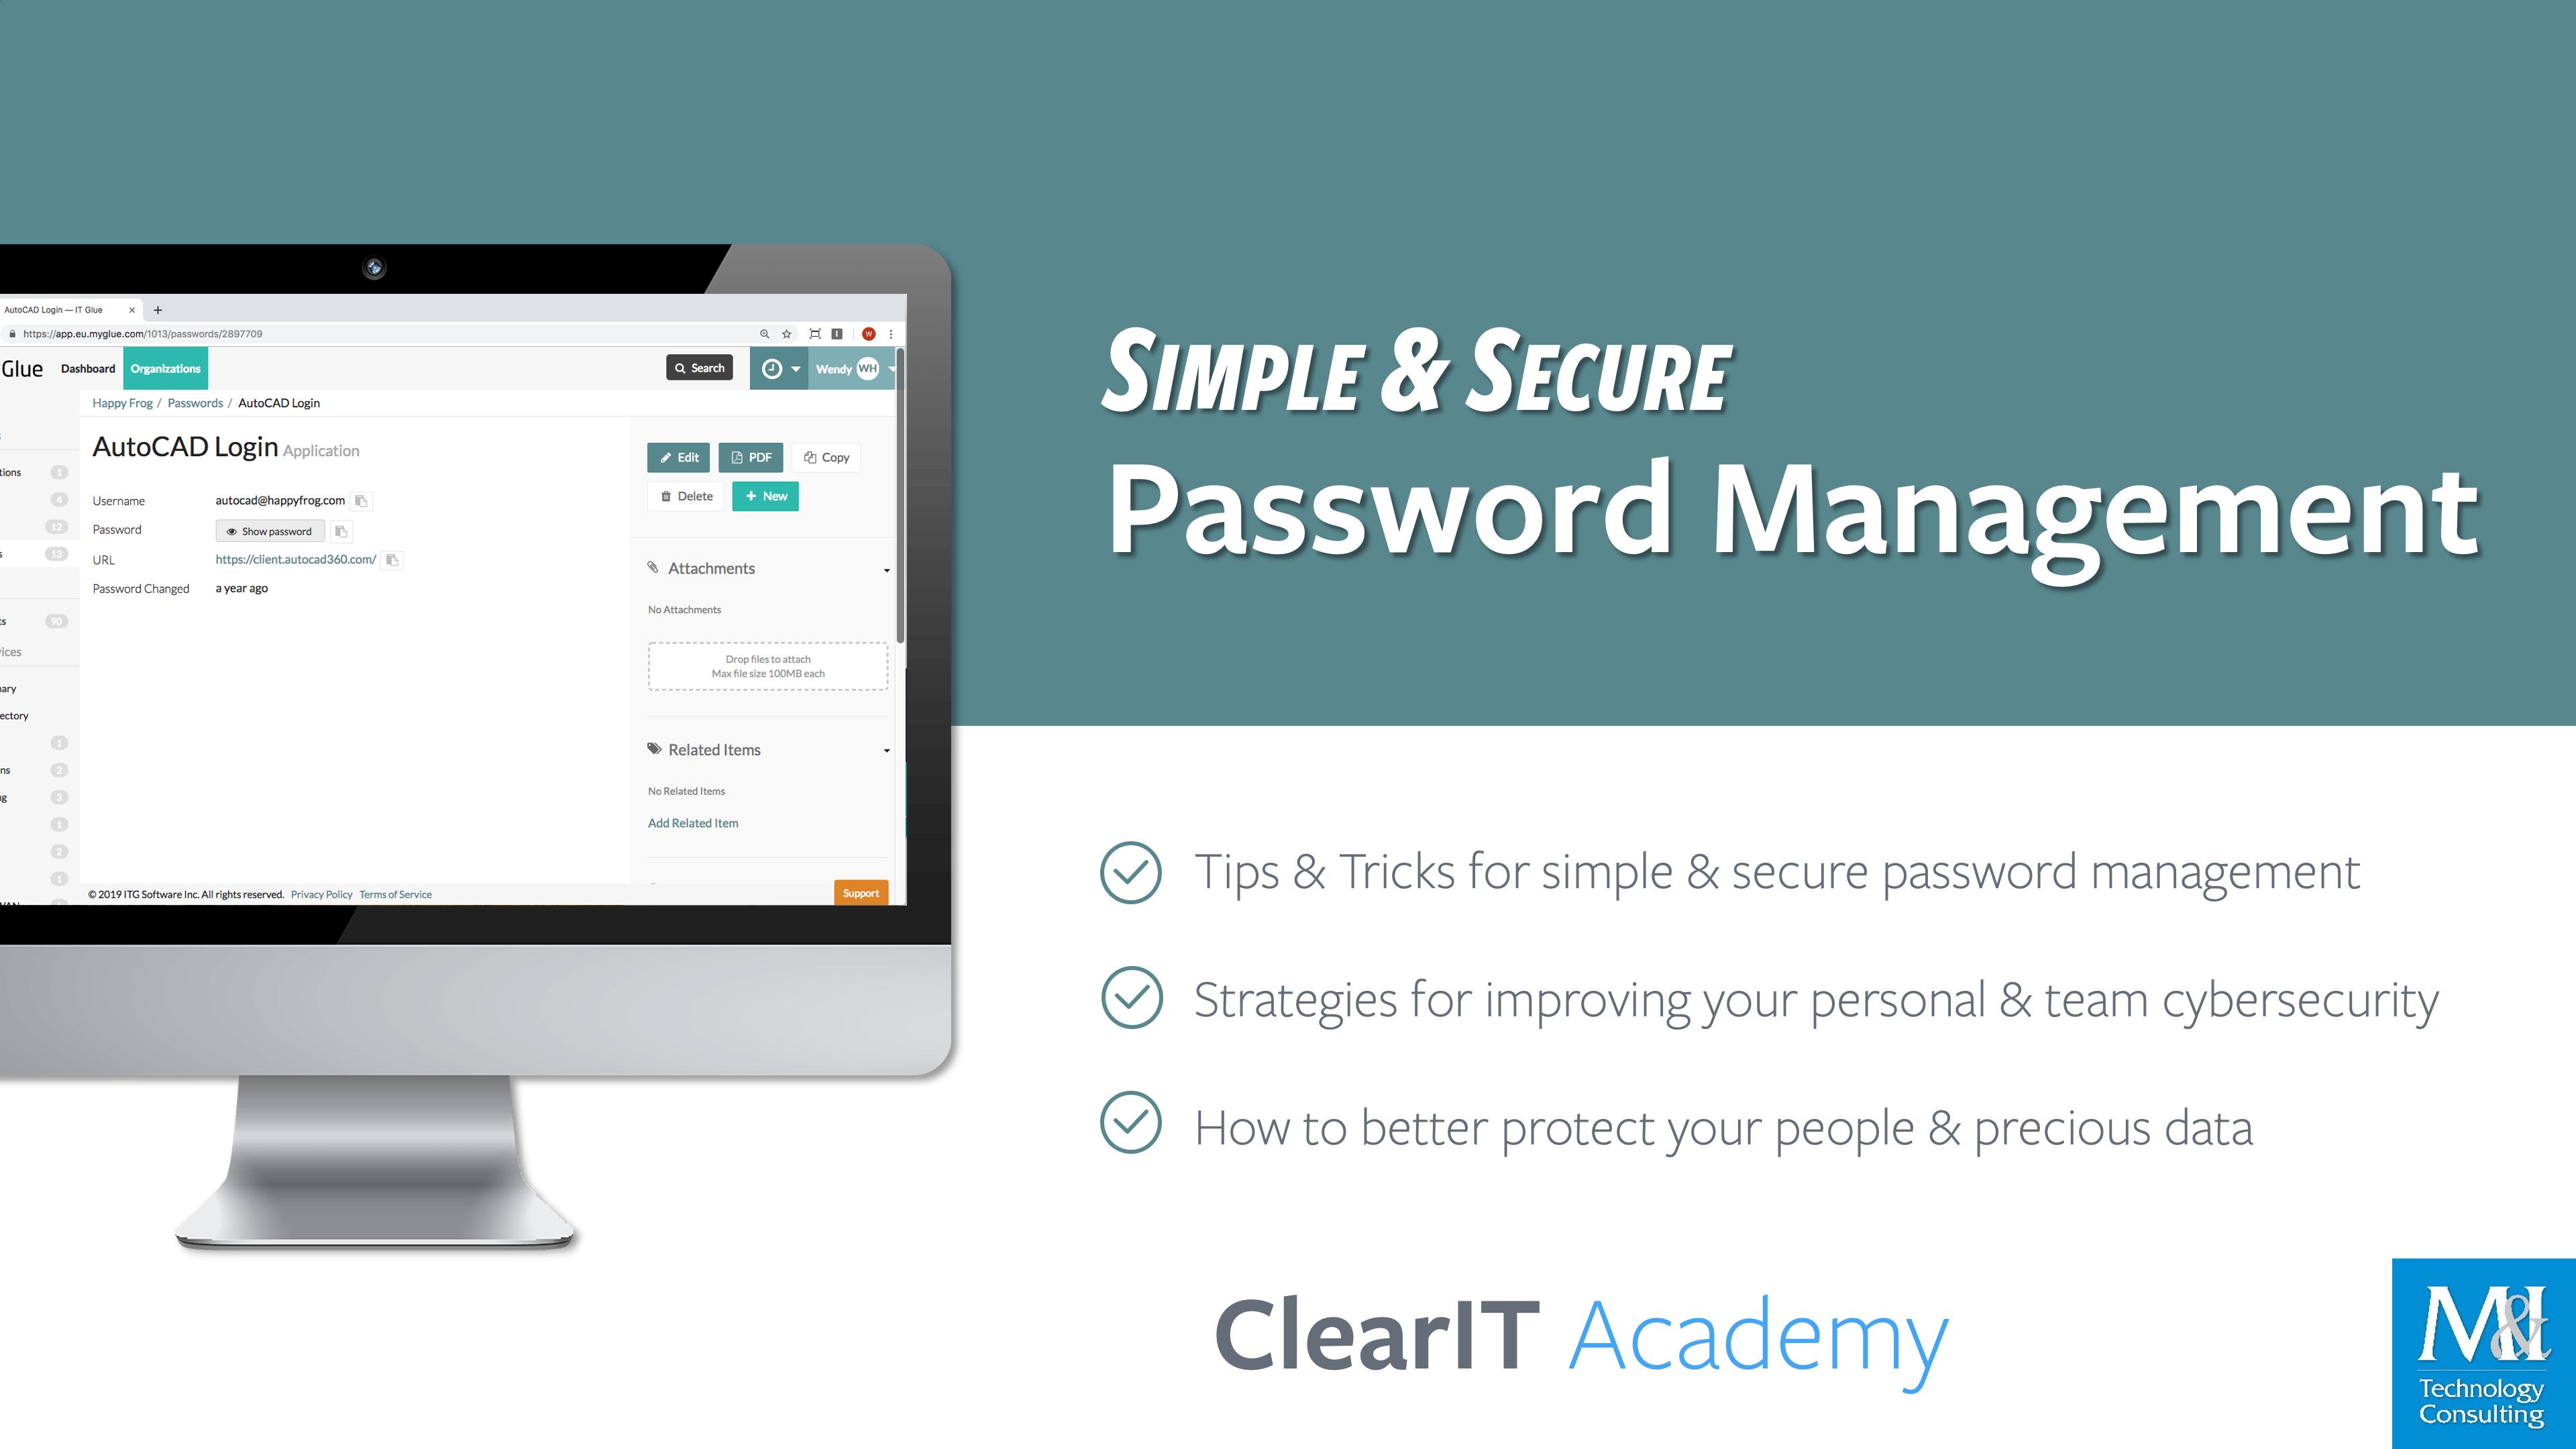 clearit-academy-password-management-title-slide